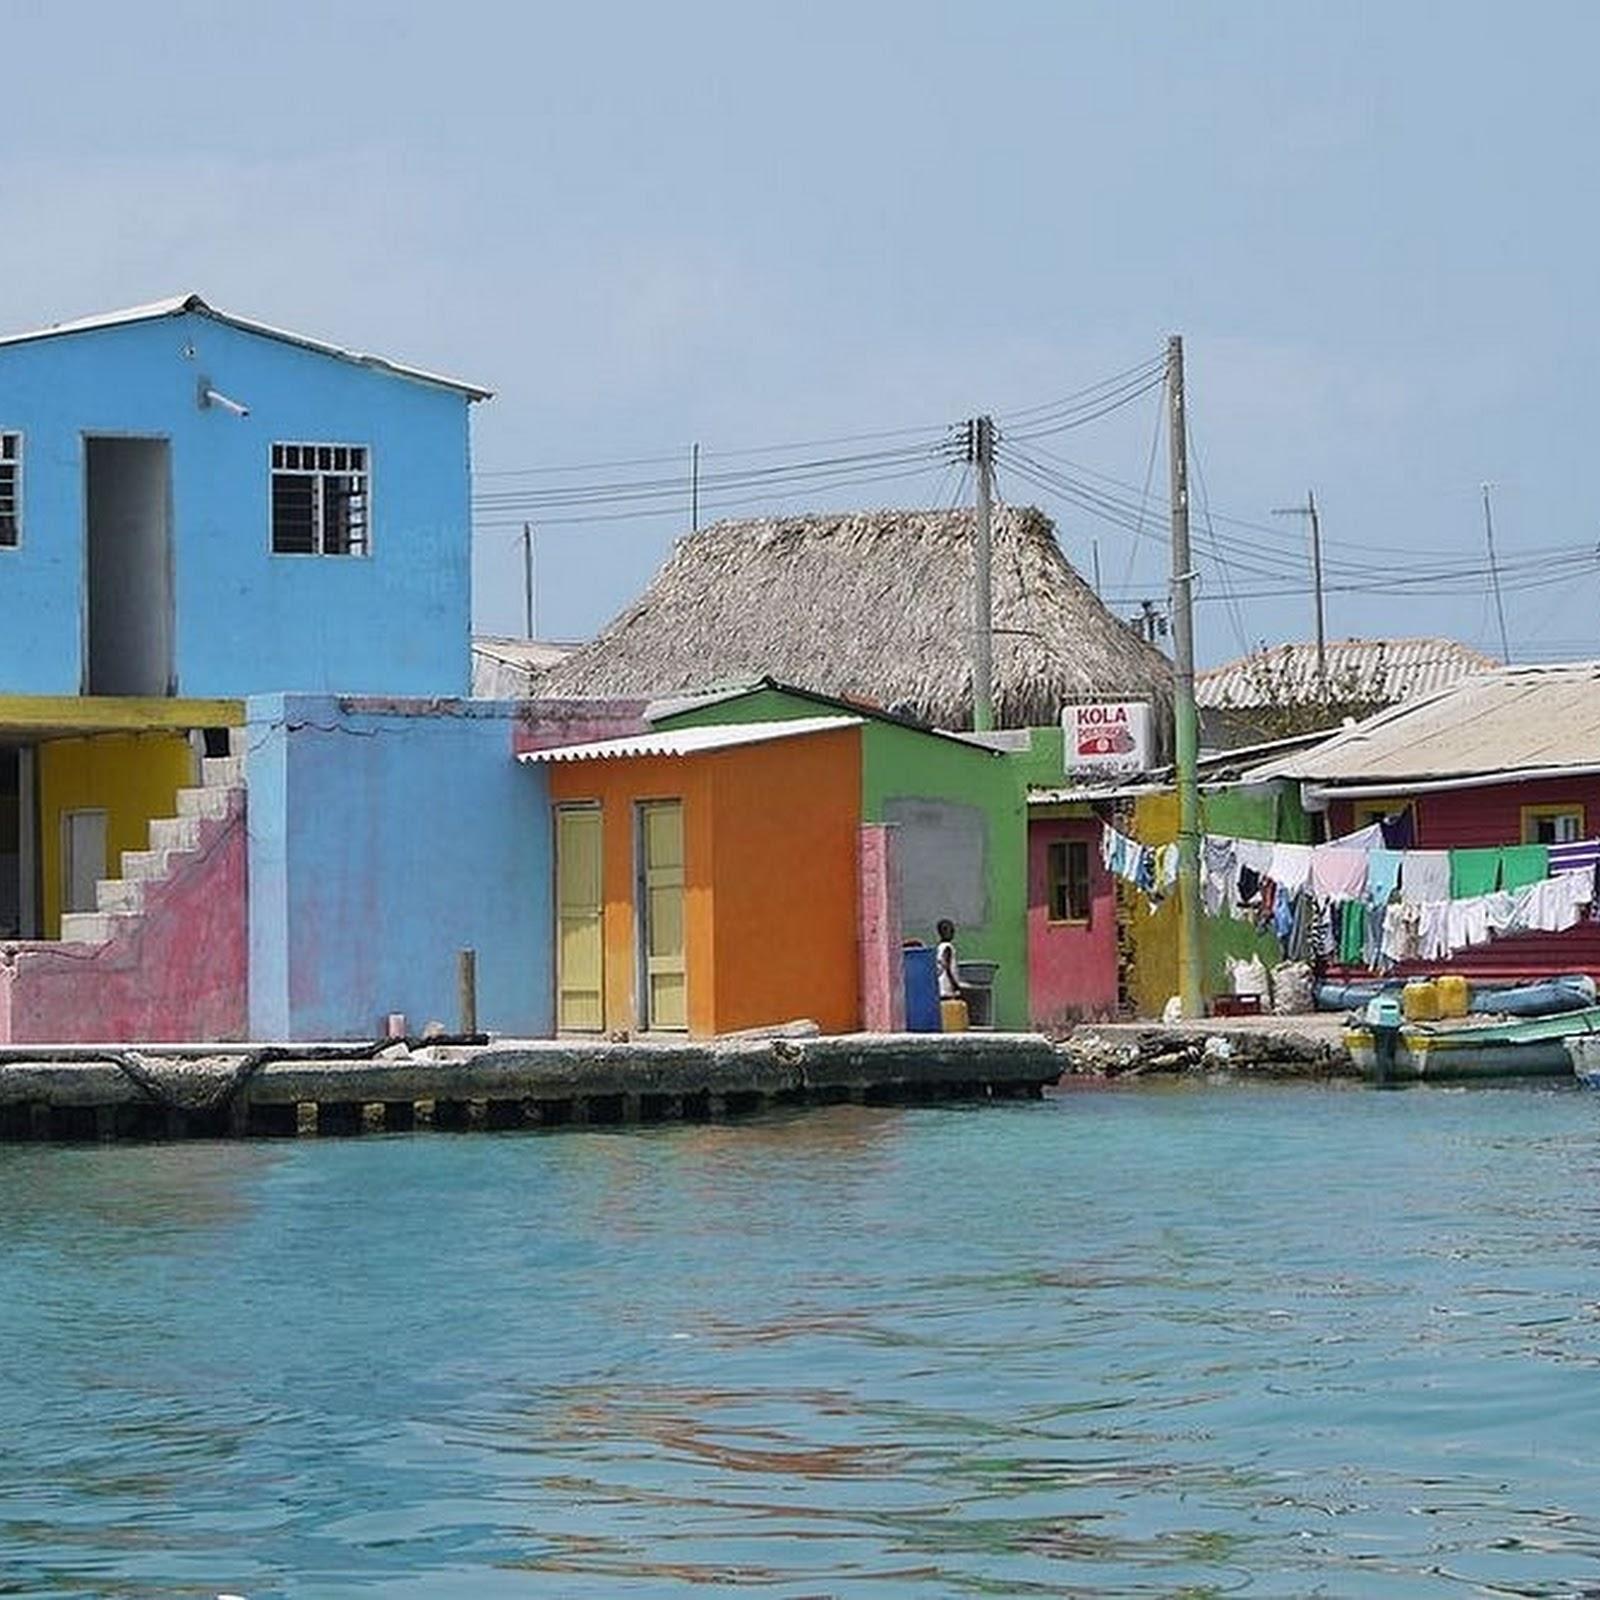 Santa Cruz Del Islote: A Crowded Utopia